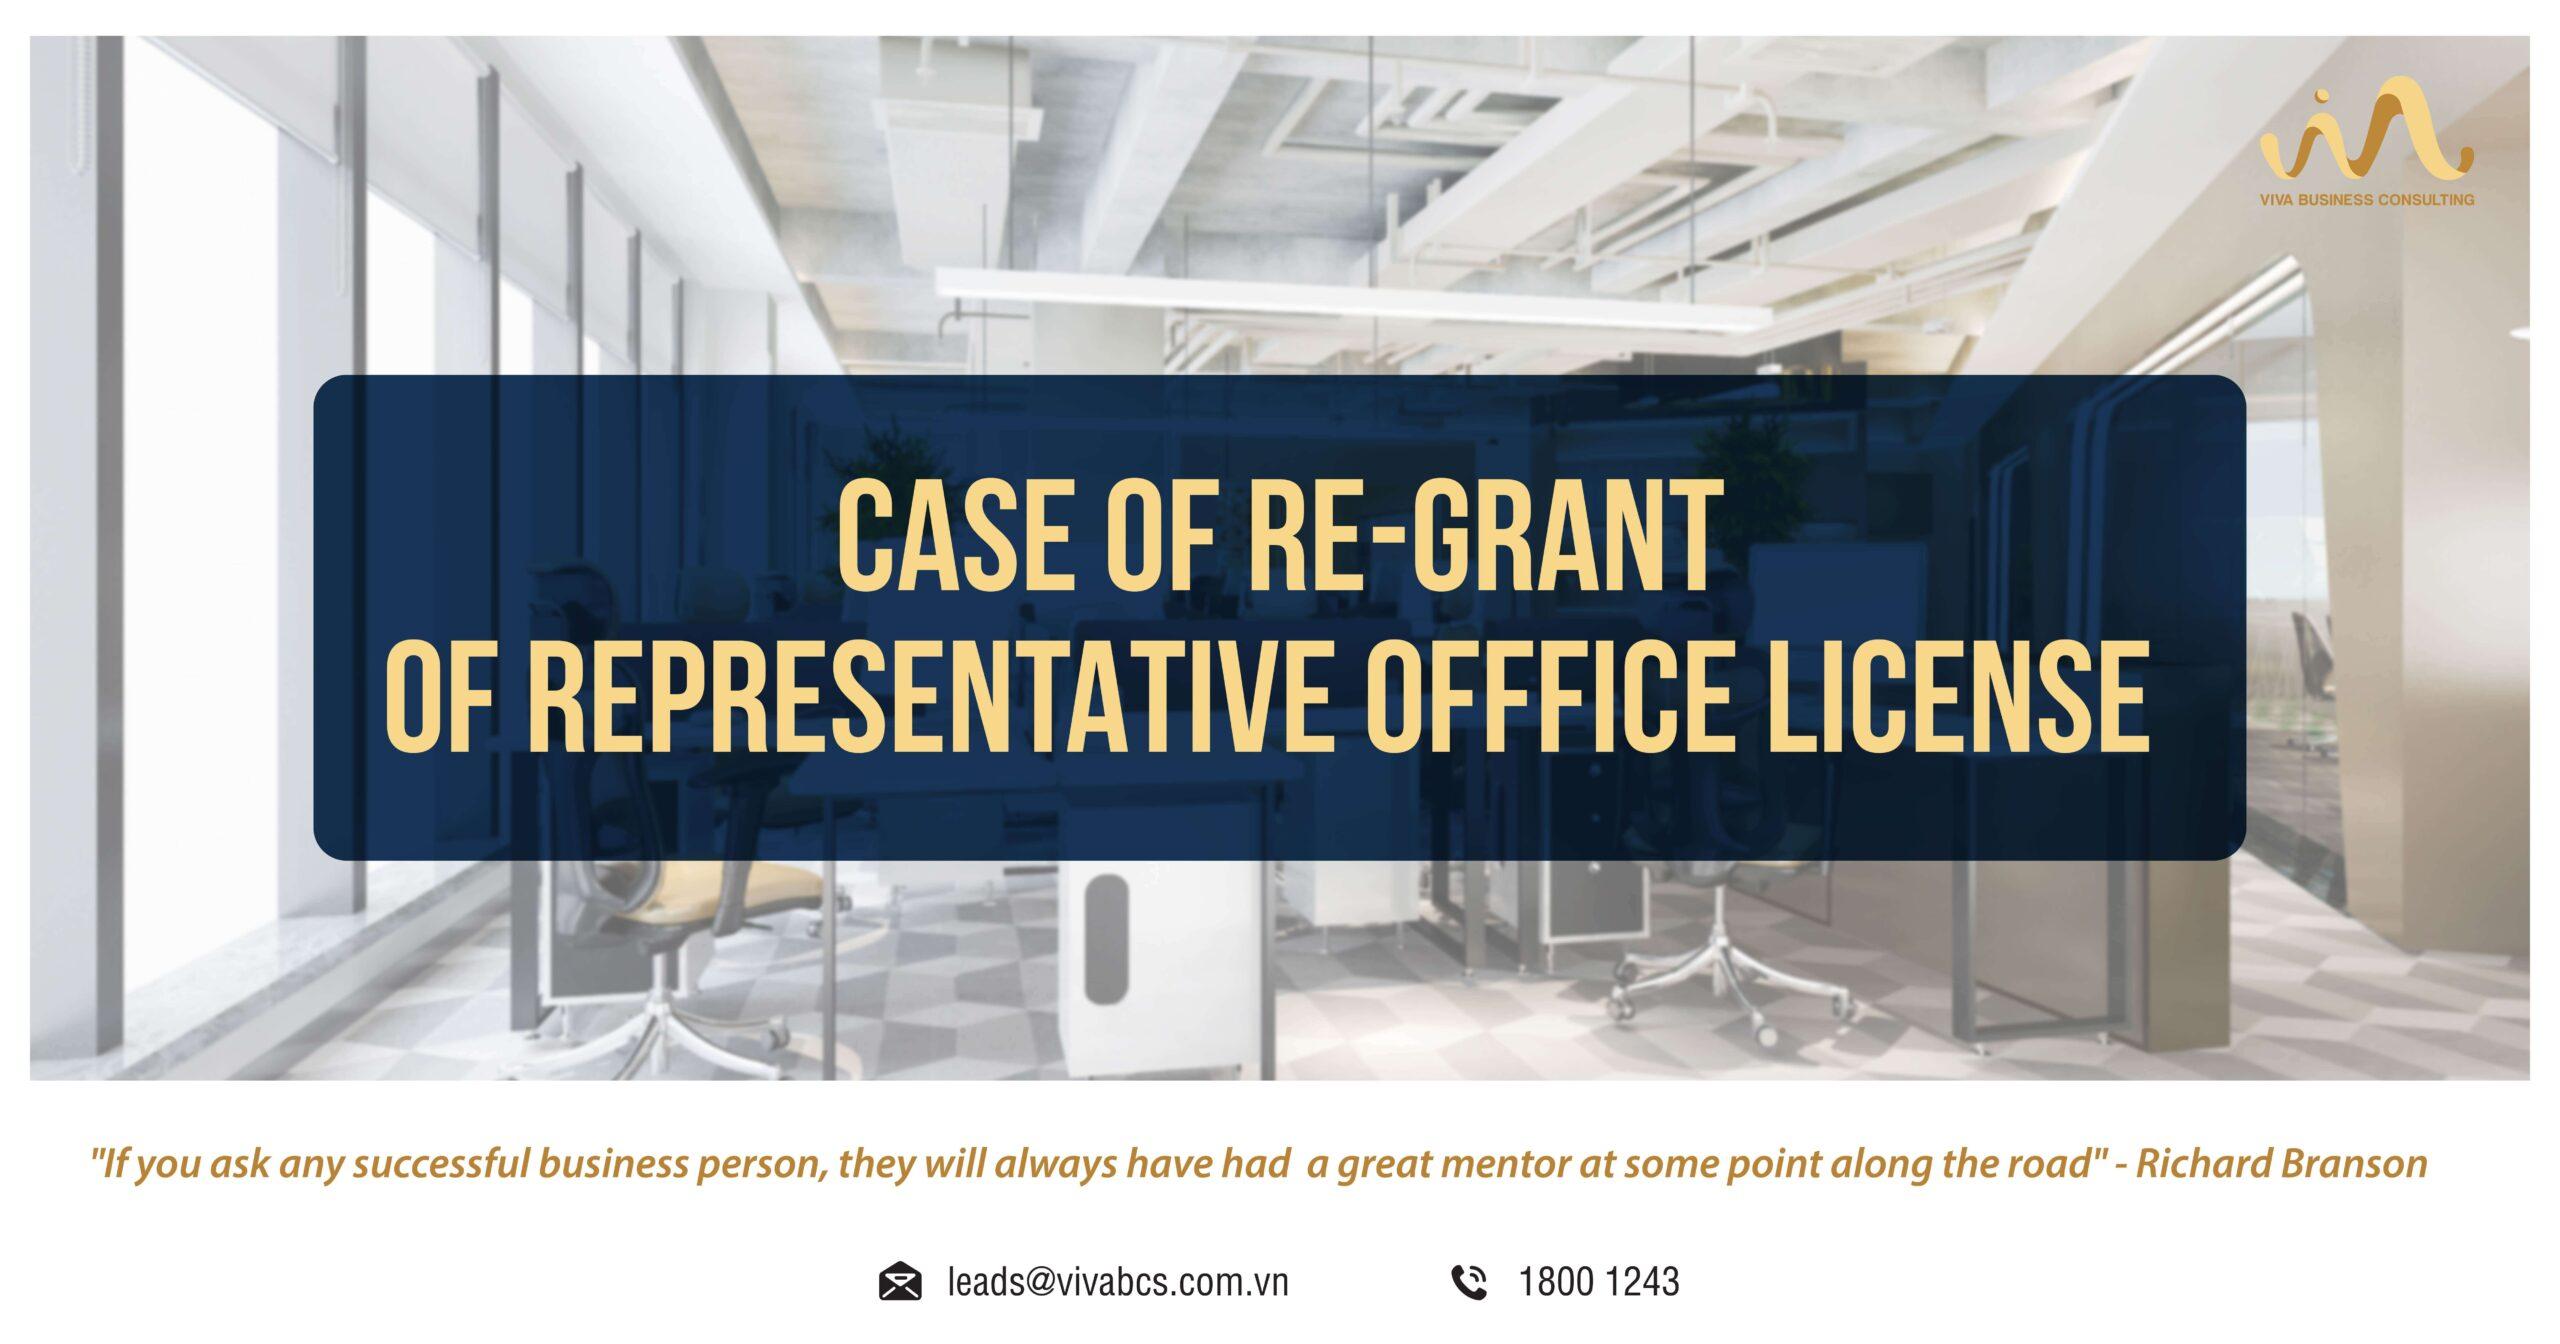 Representative office in Vietnam: Cases of Re-grant license